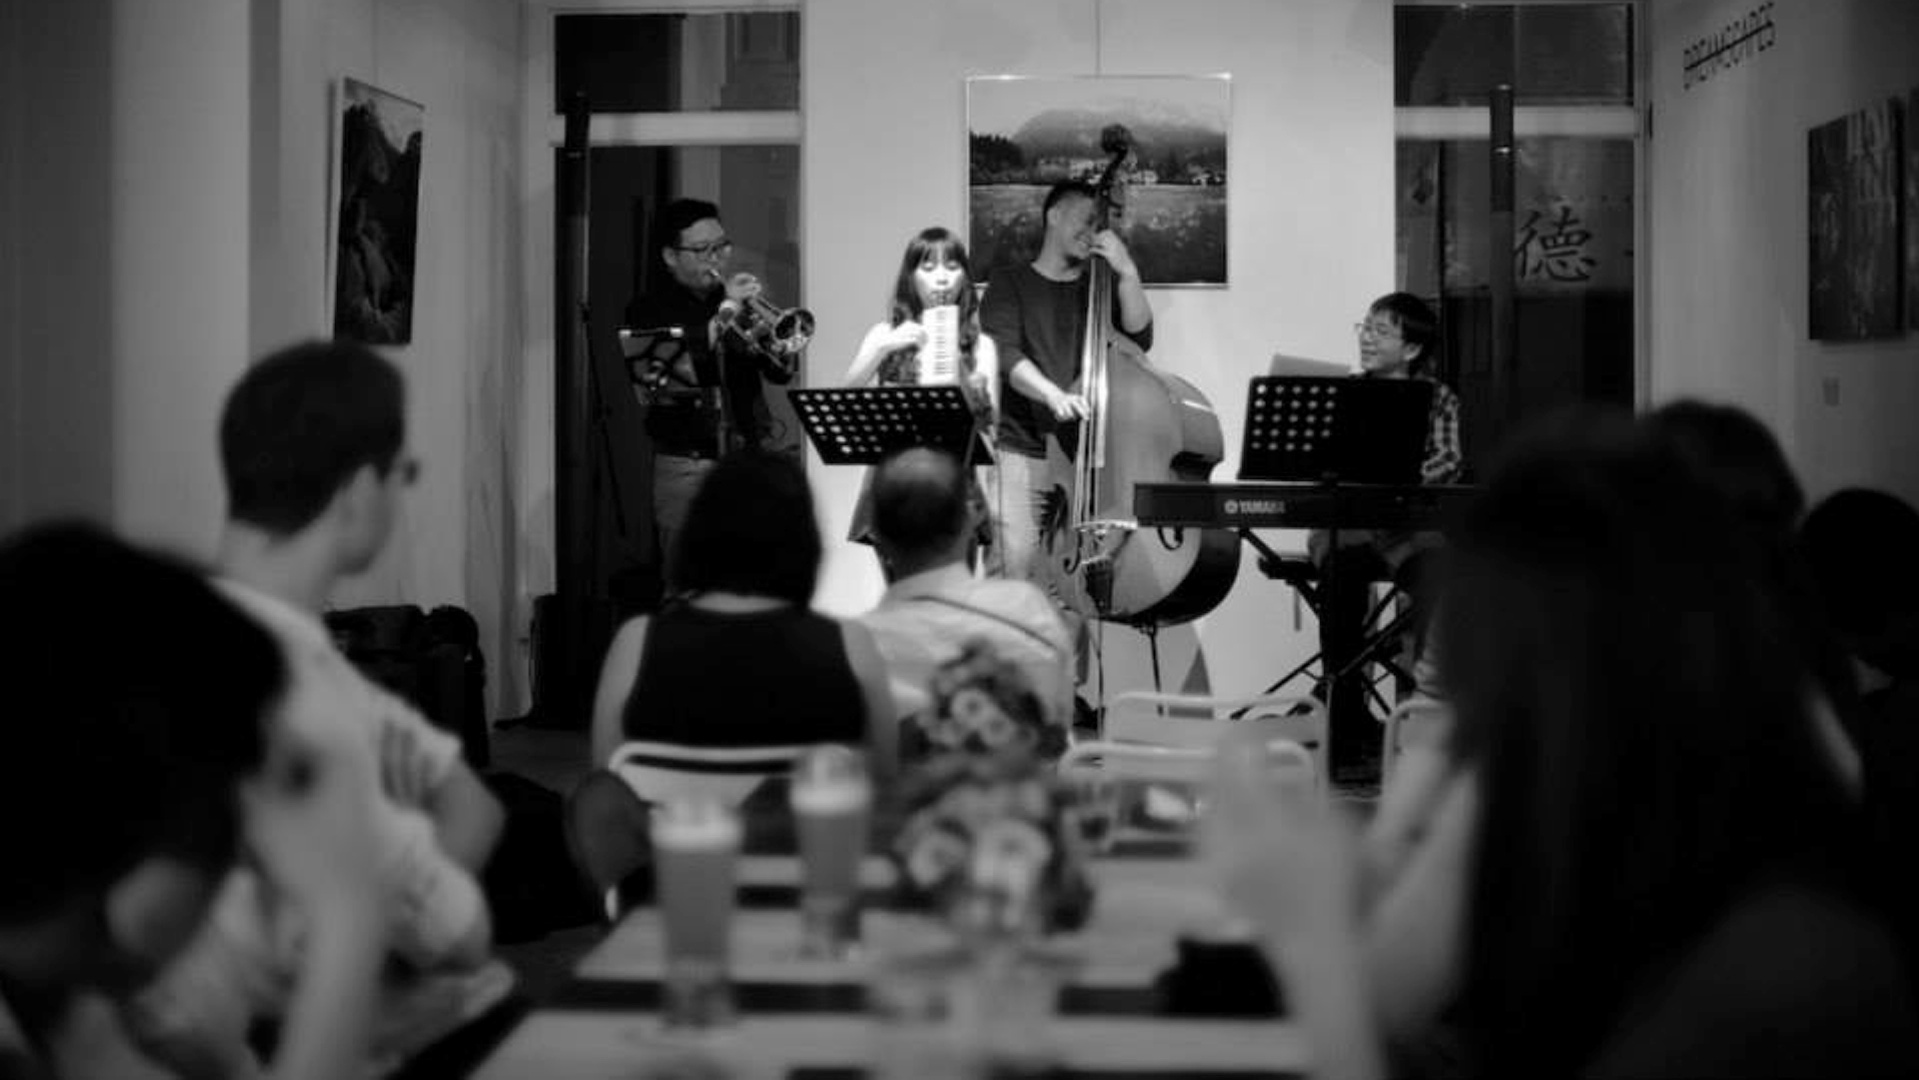 Mosaic 2014: All That Jazz